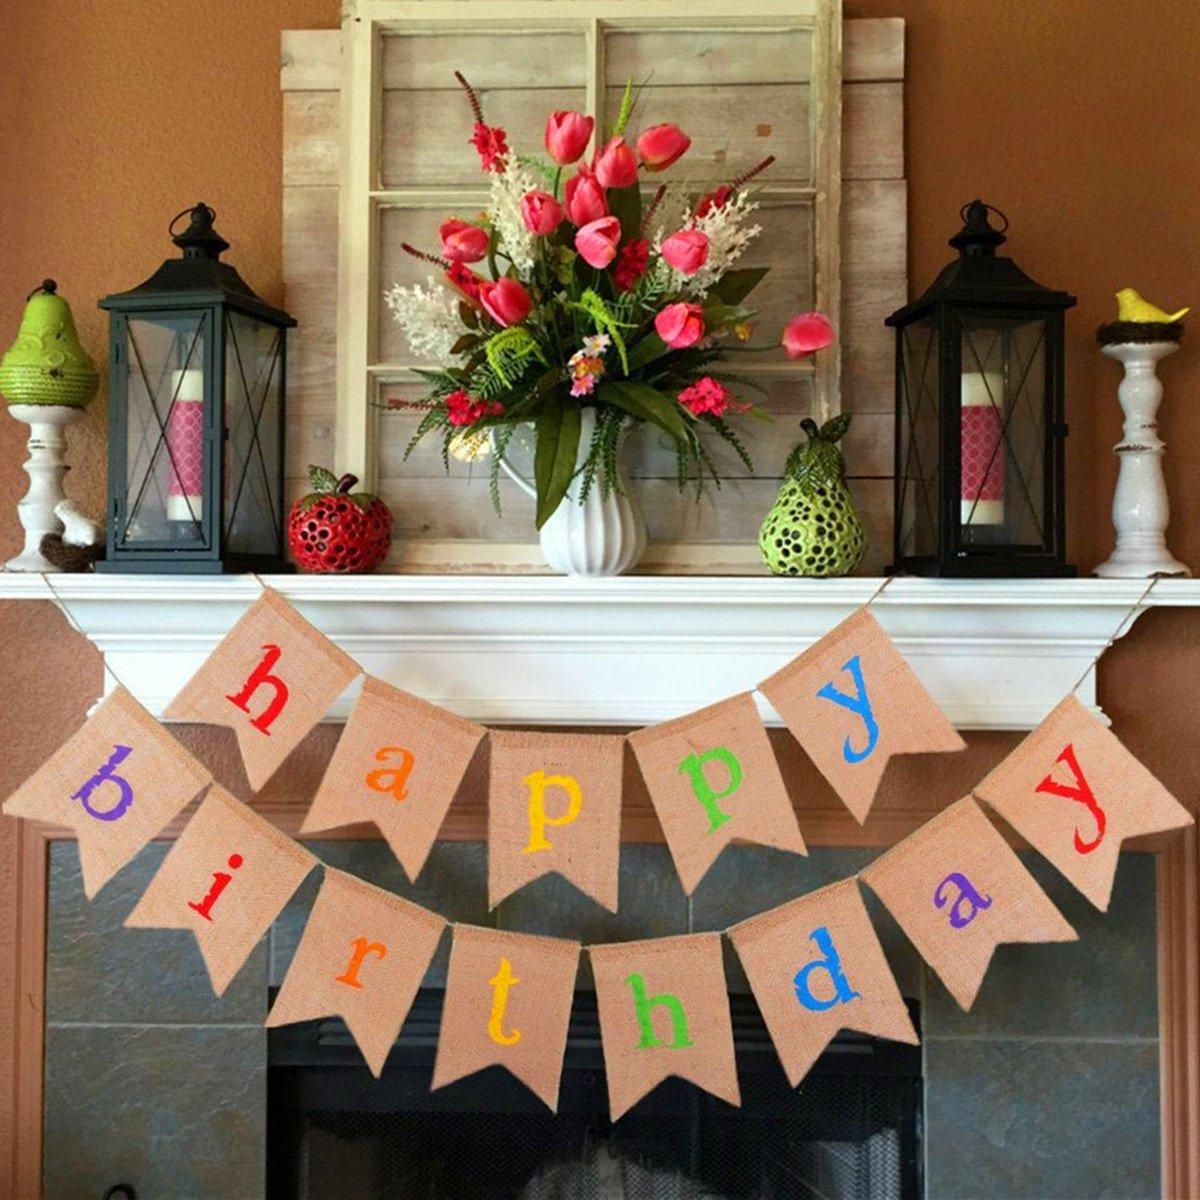 Burlap Happy Birthday Banner, Colorful Happy Birthday Banner for Birthday Party Decorations VAG041S